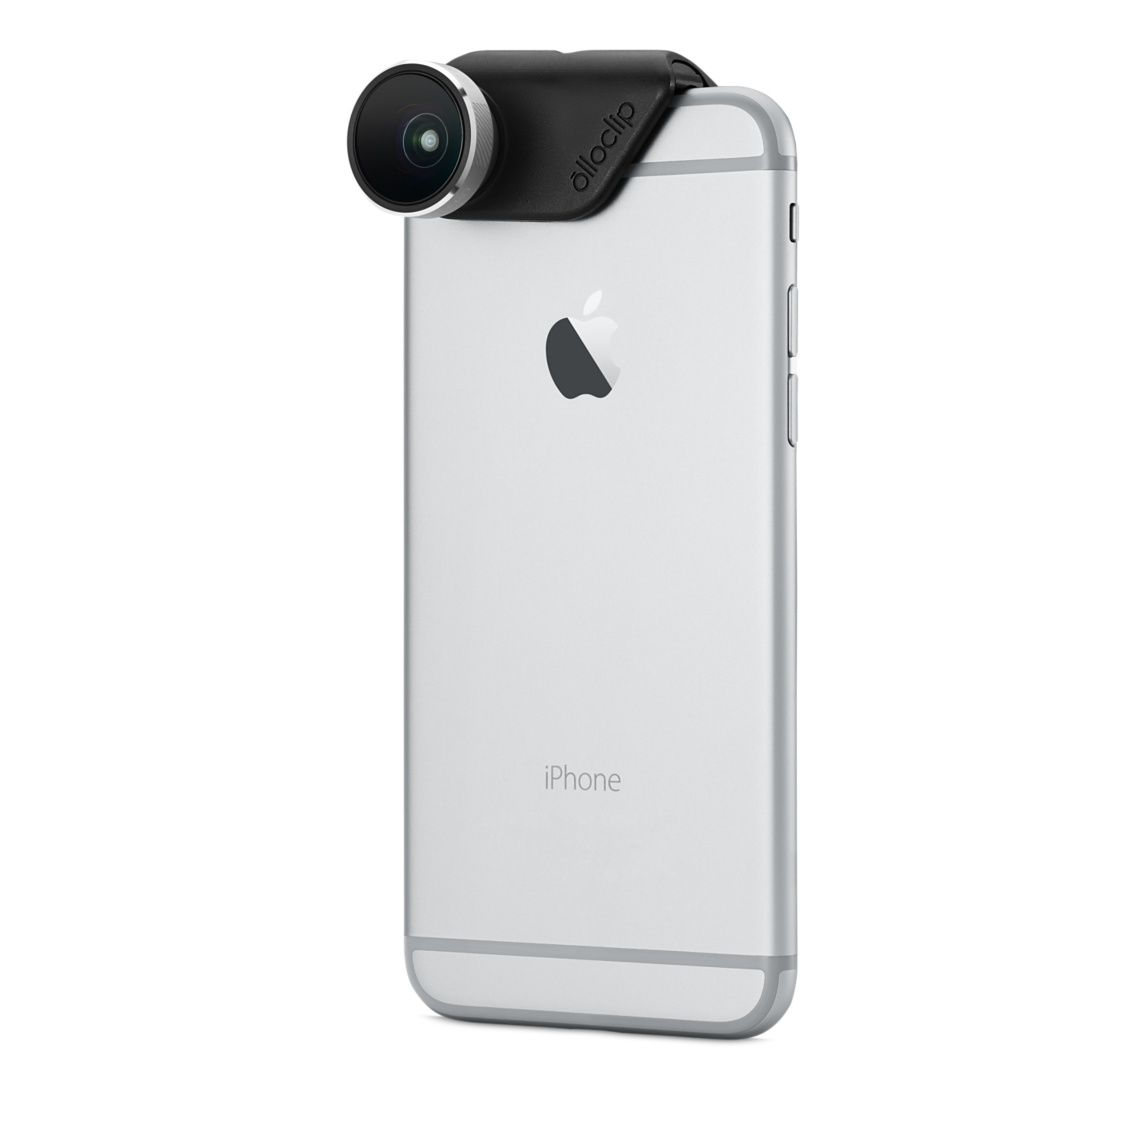 Inline 1 iphone olloclip photos photo lens